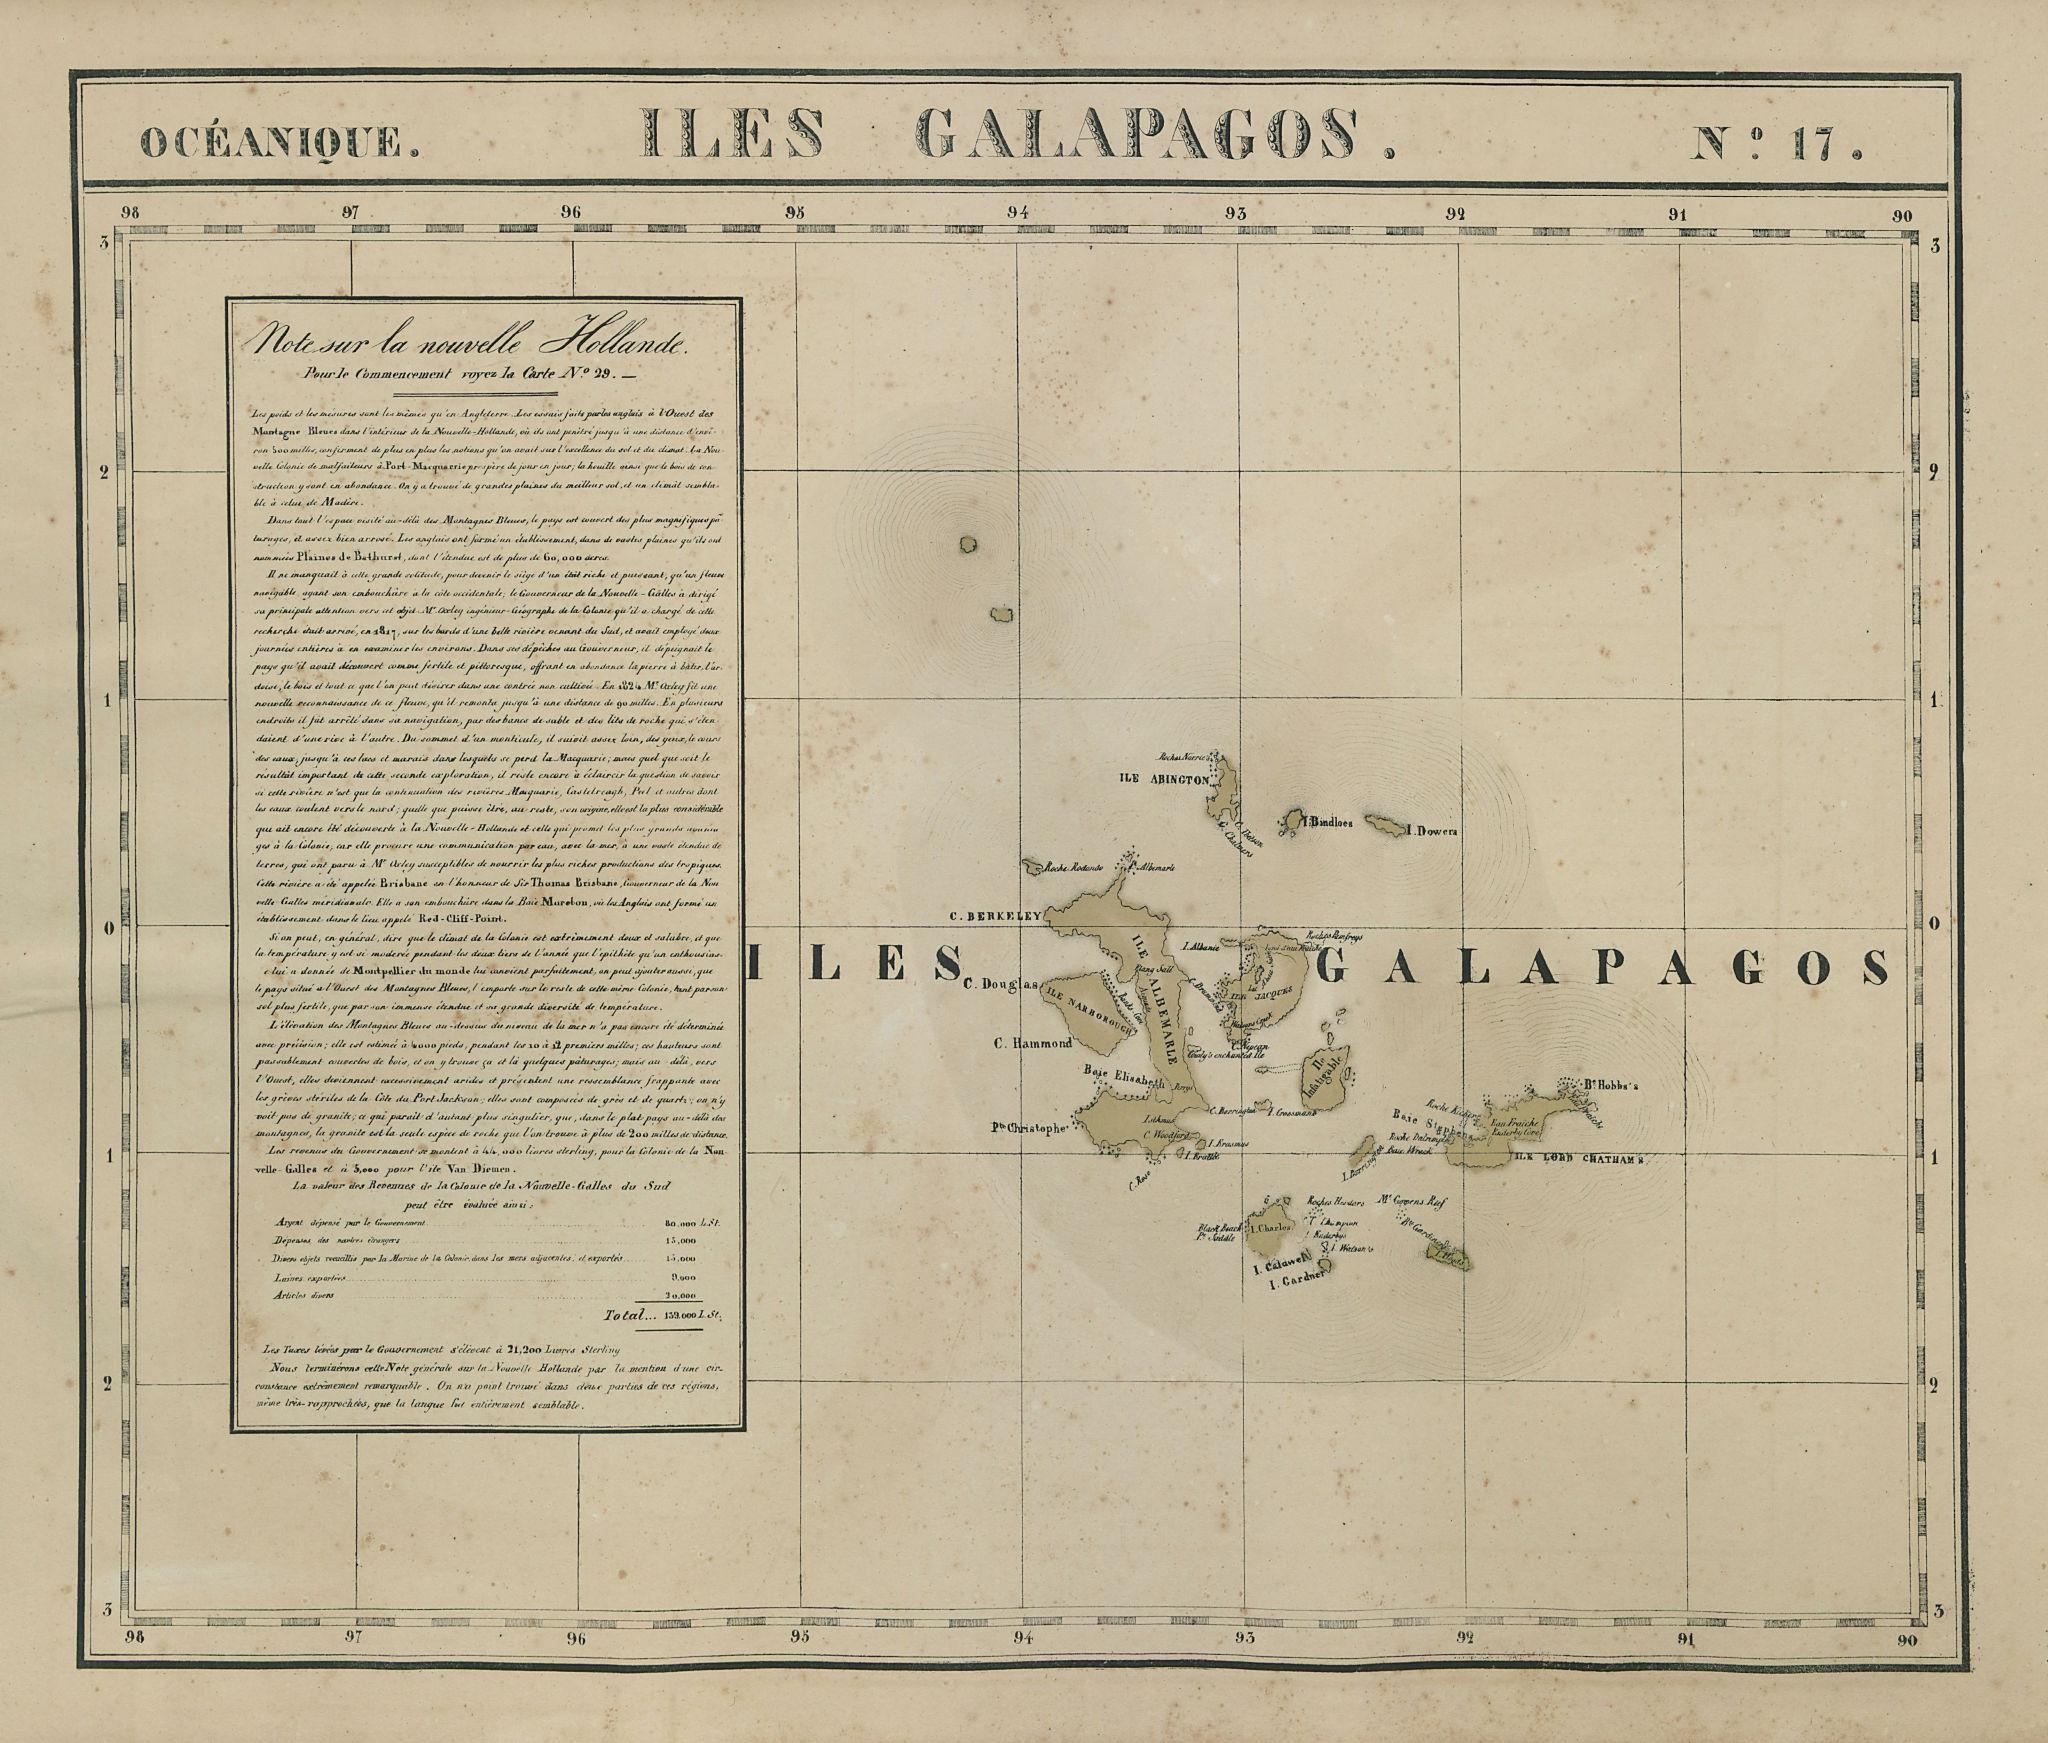 Océanique. Iles Galapagos #17. Galapagos Islands Ecuador. VANDERMAELEN 1827 map